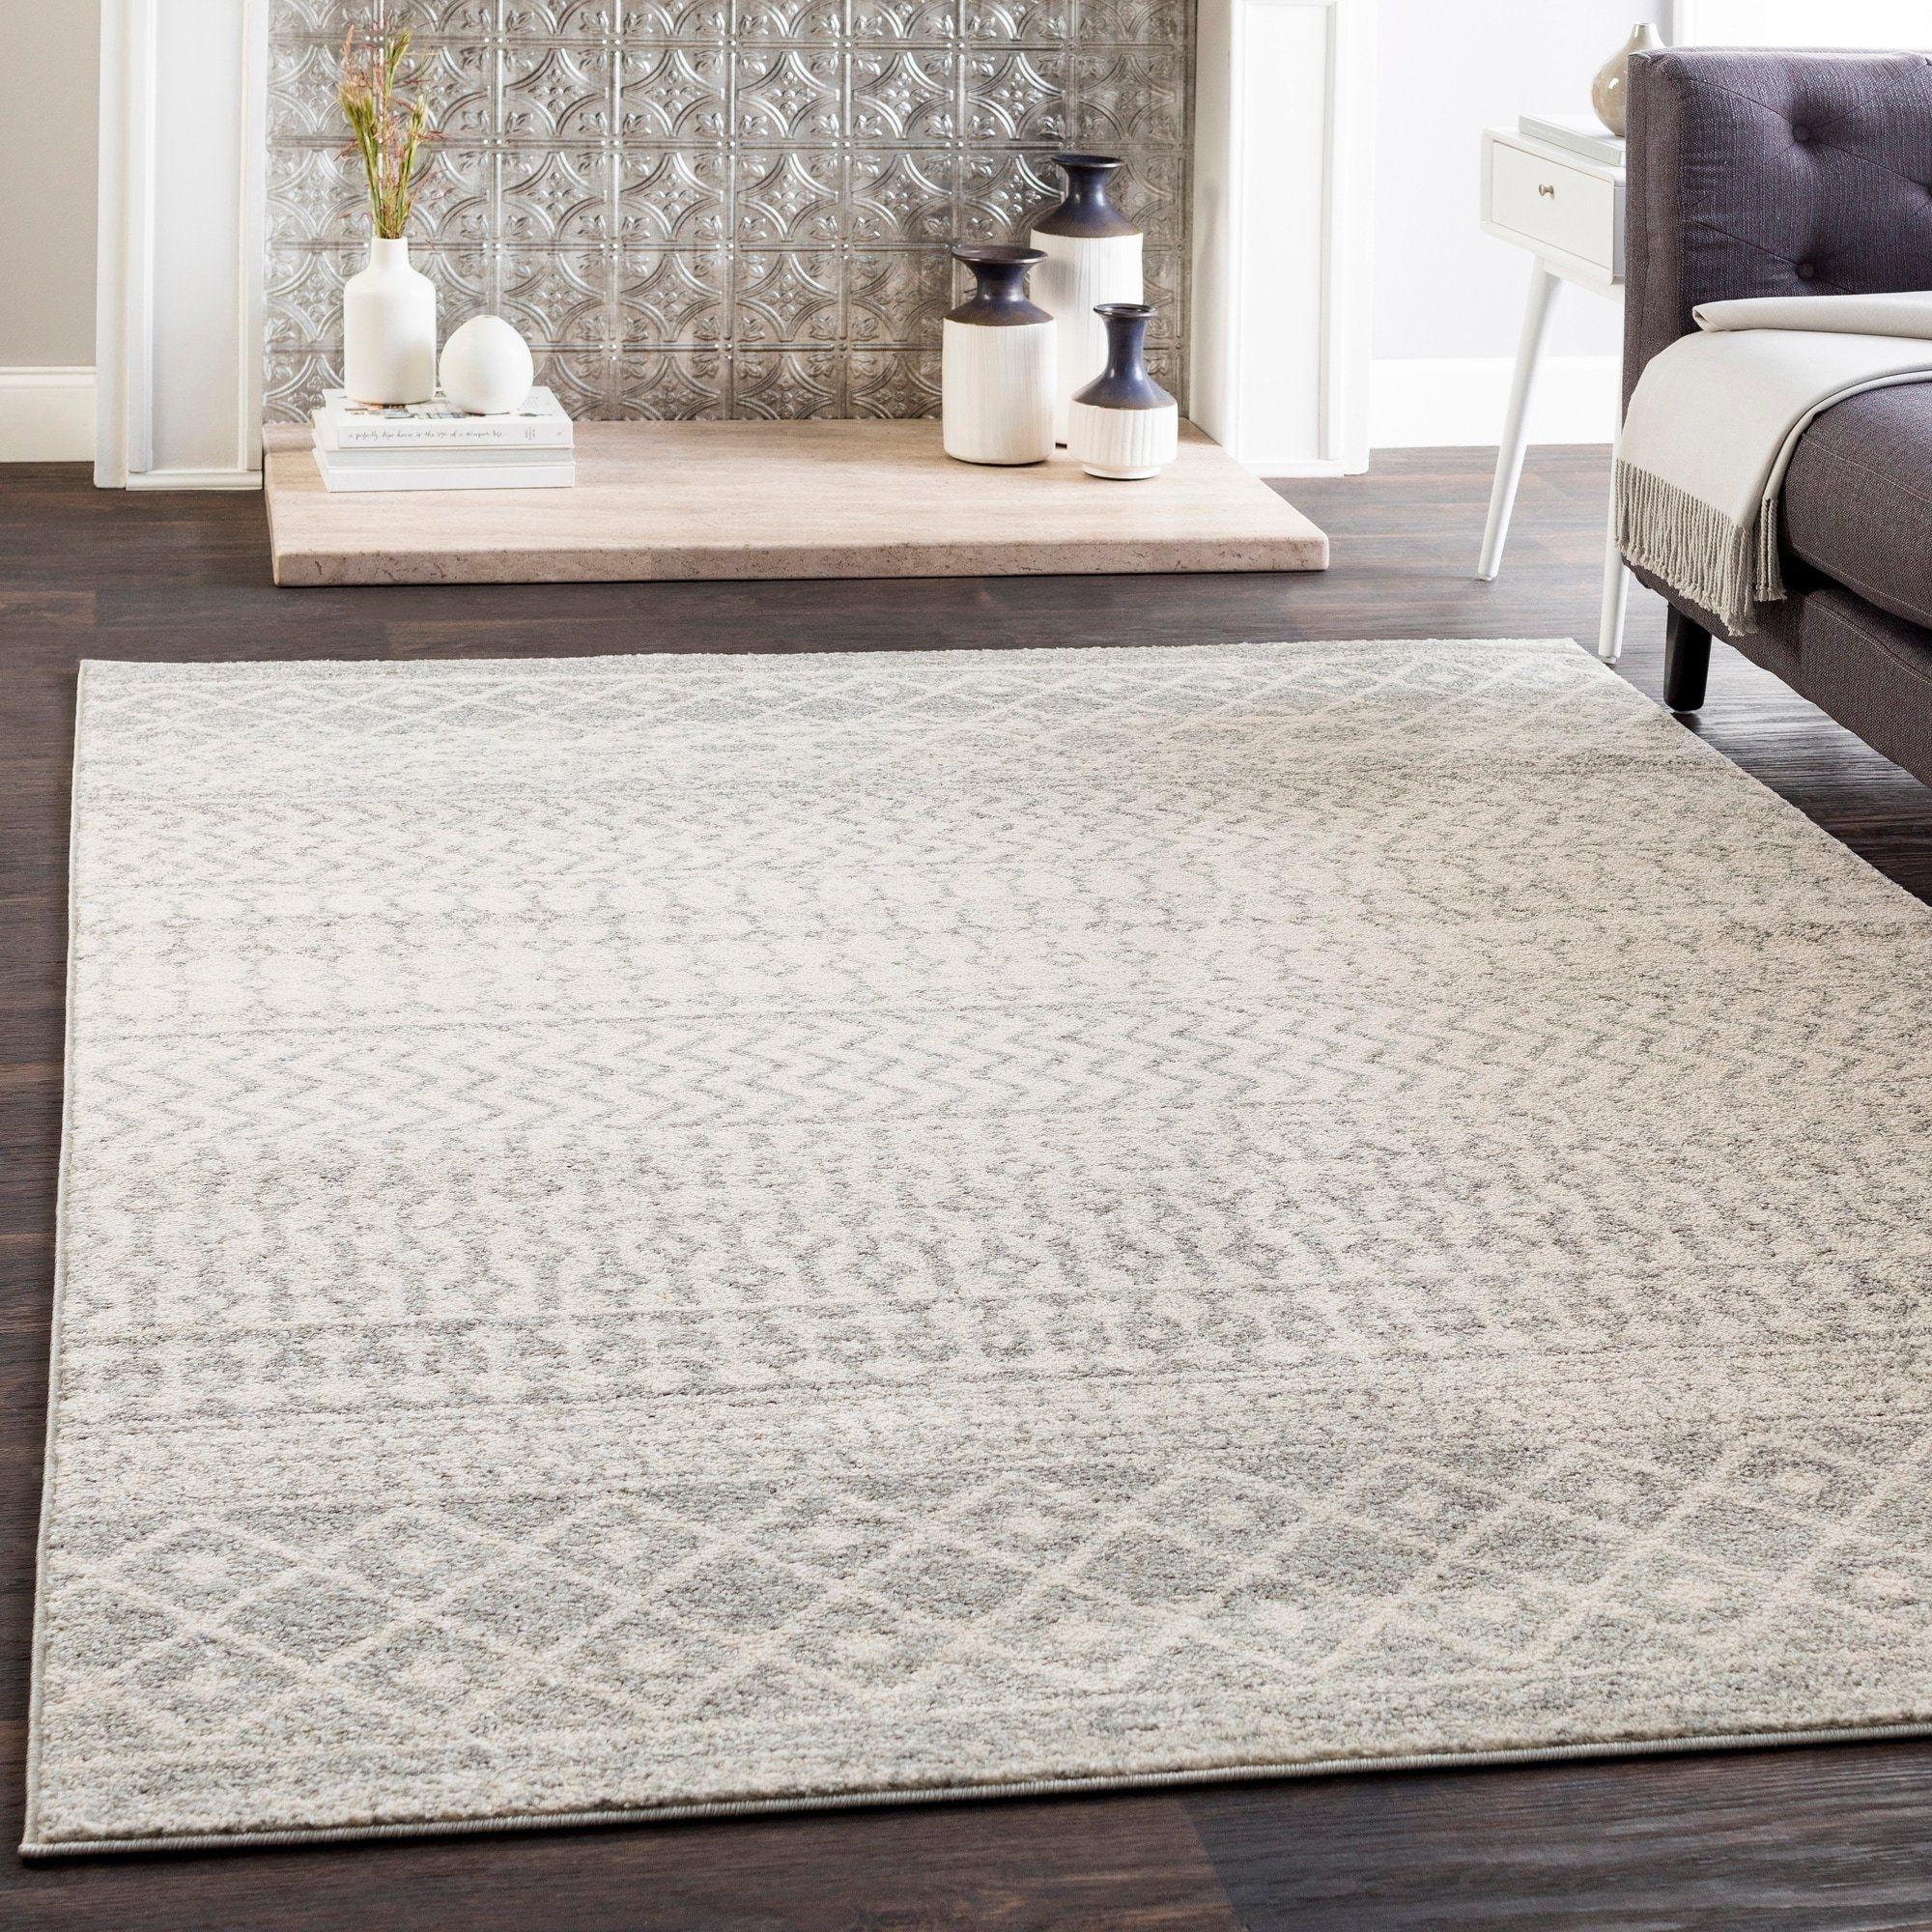 Distressed Geometric Ivory Gray Area Rug Bohemian Area Rugs Cool Rugs Grey Area Rug 5 x 10 area rugs